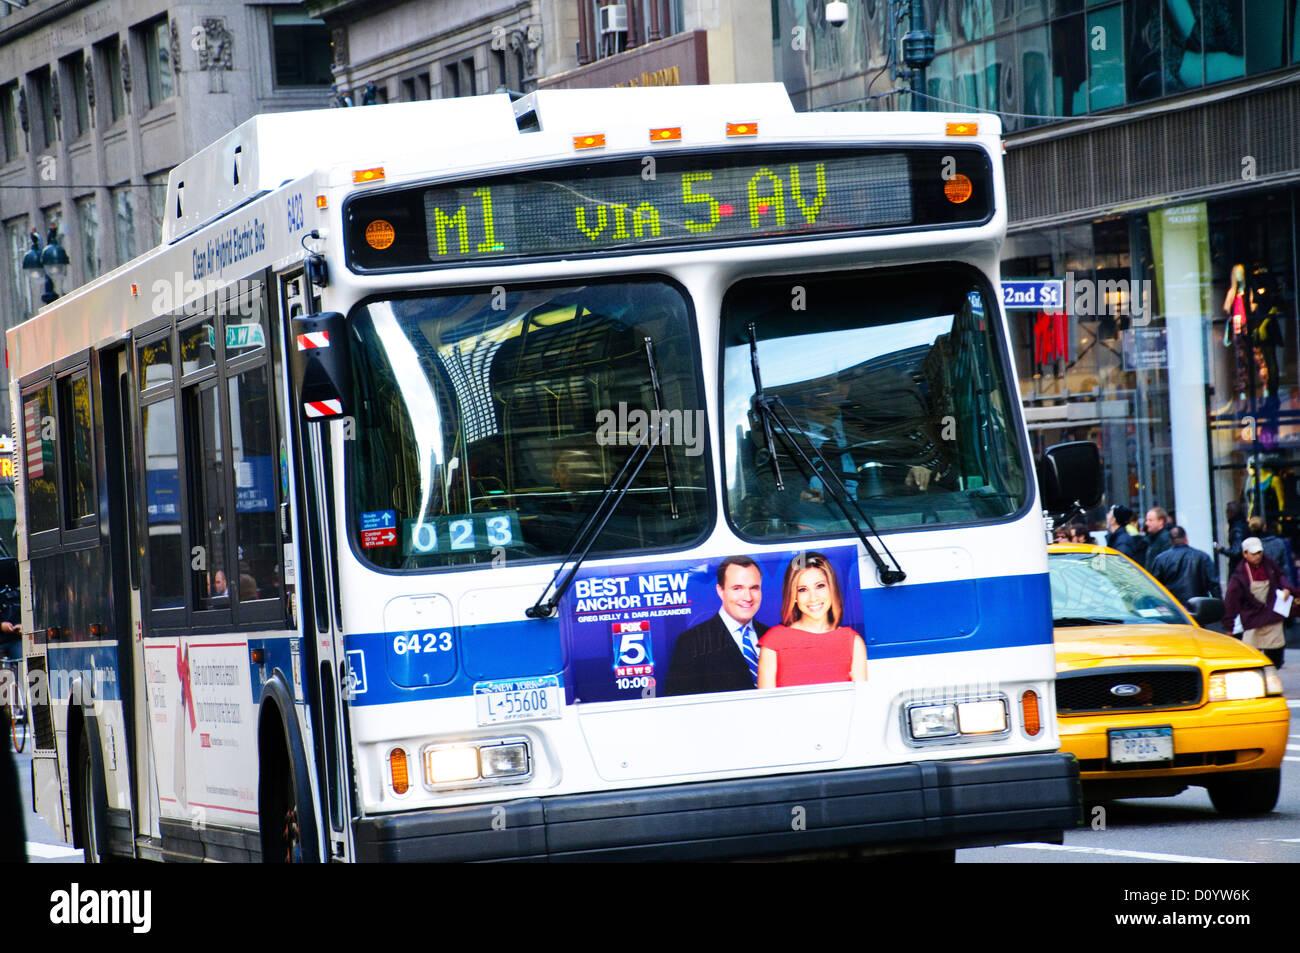 m1 buss